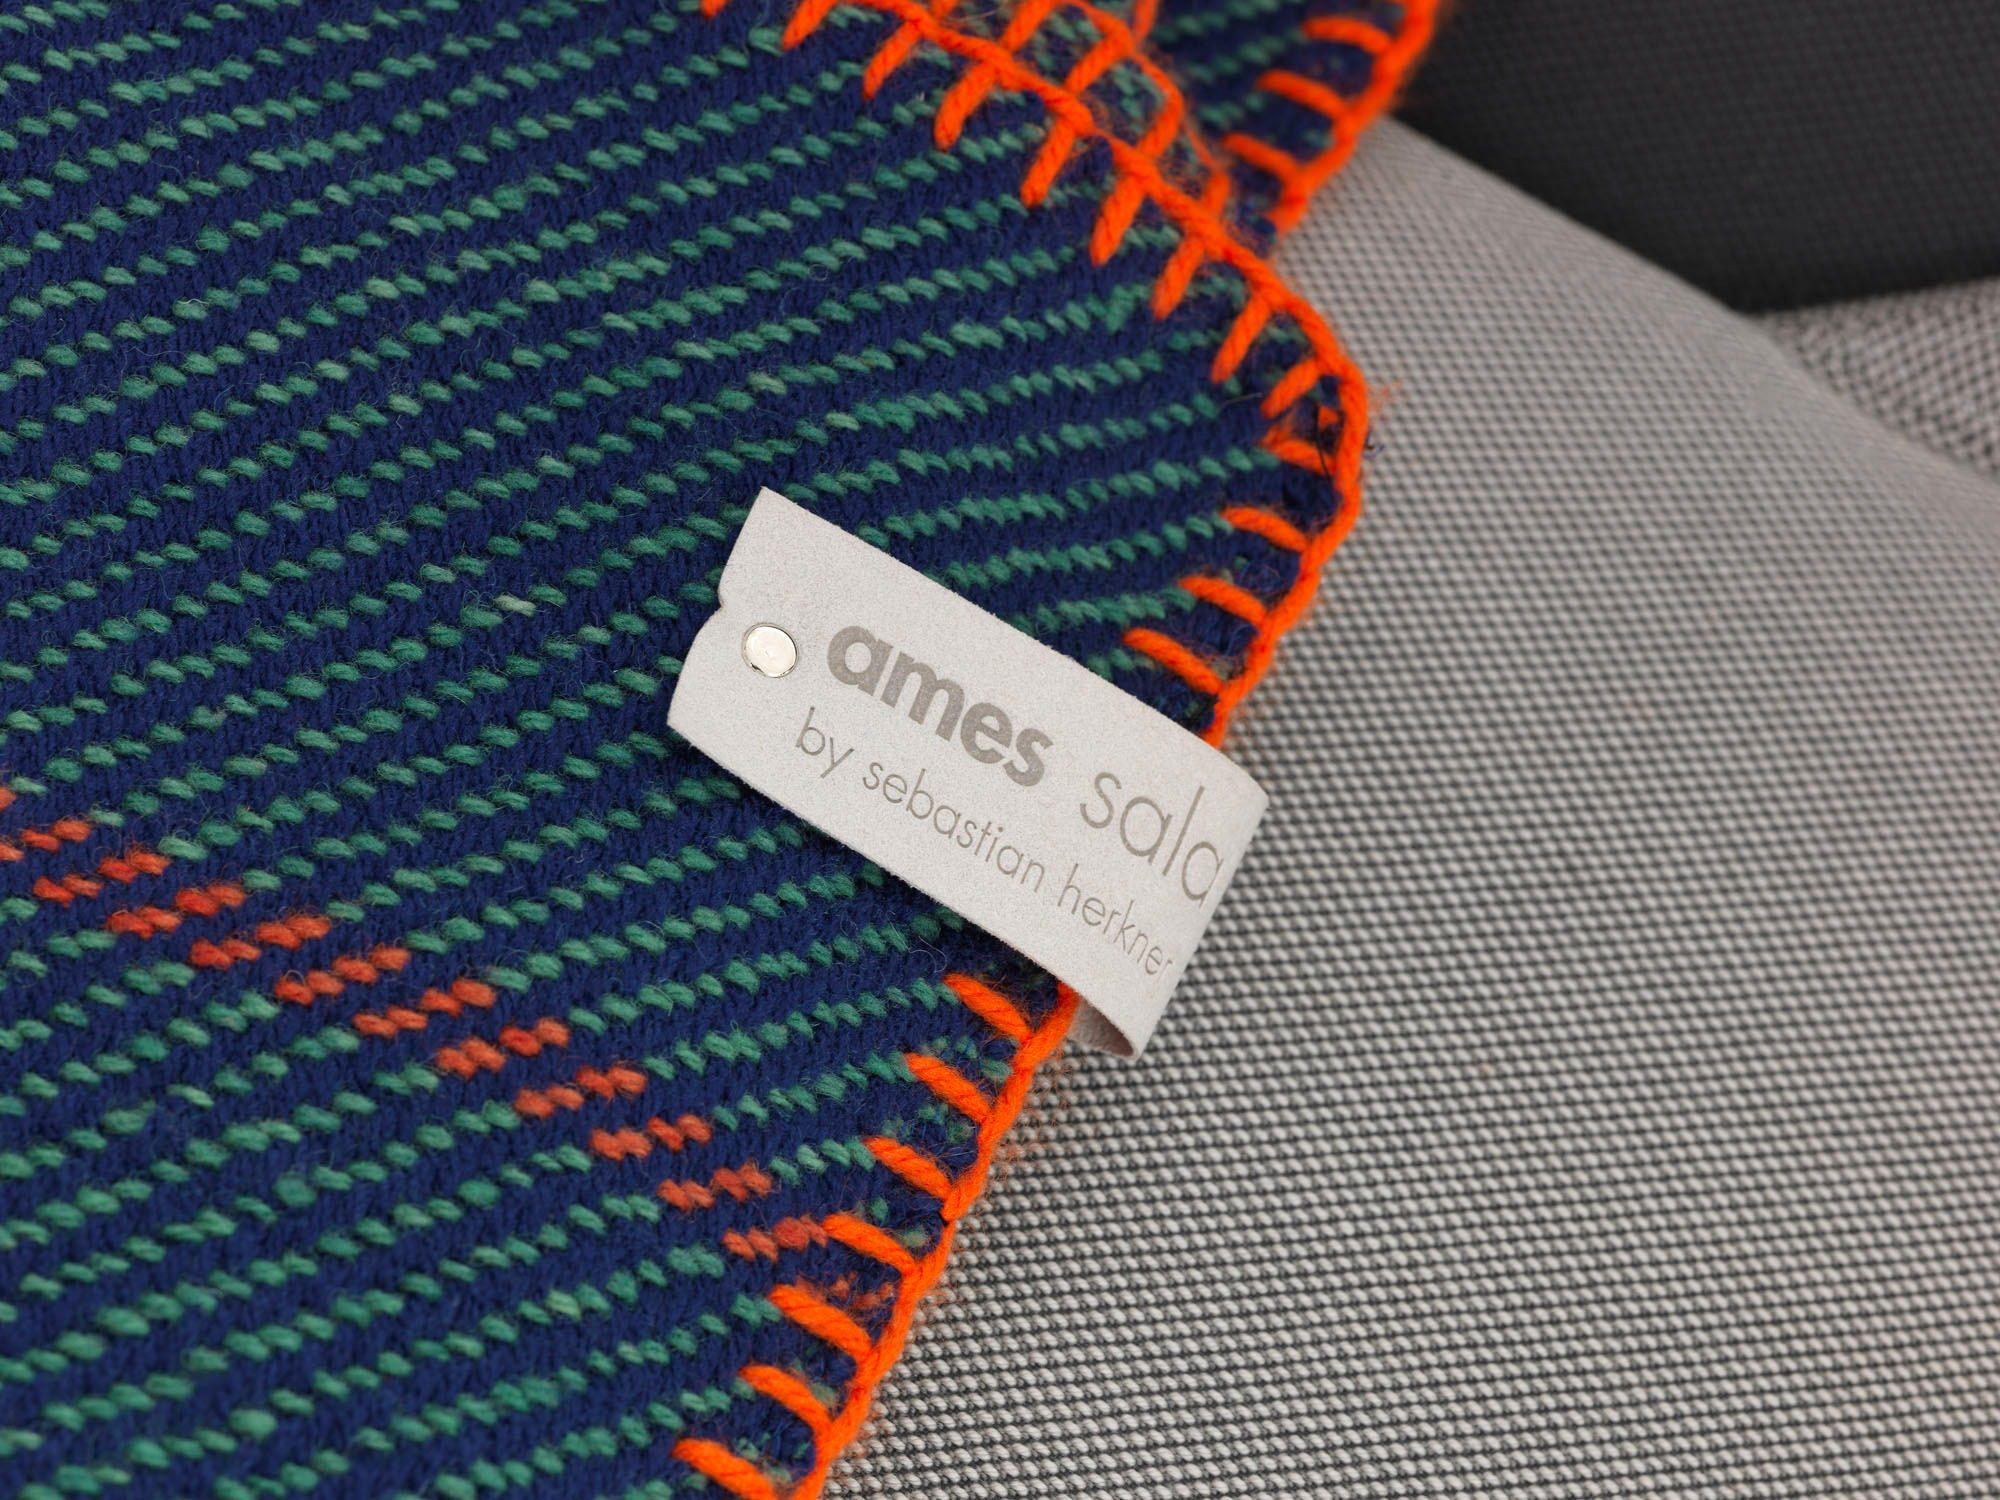 manta plaid gr n blau orange plaids blankets from ames architonic. Black Bedroom Furniture Sets. Home Design Ideas